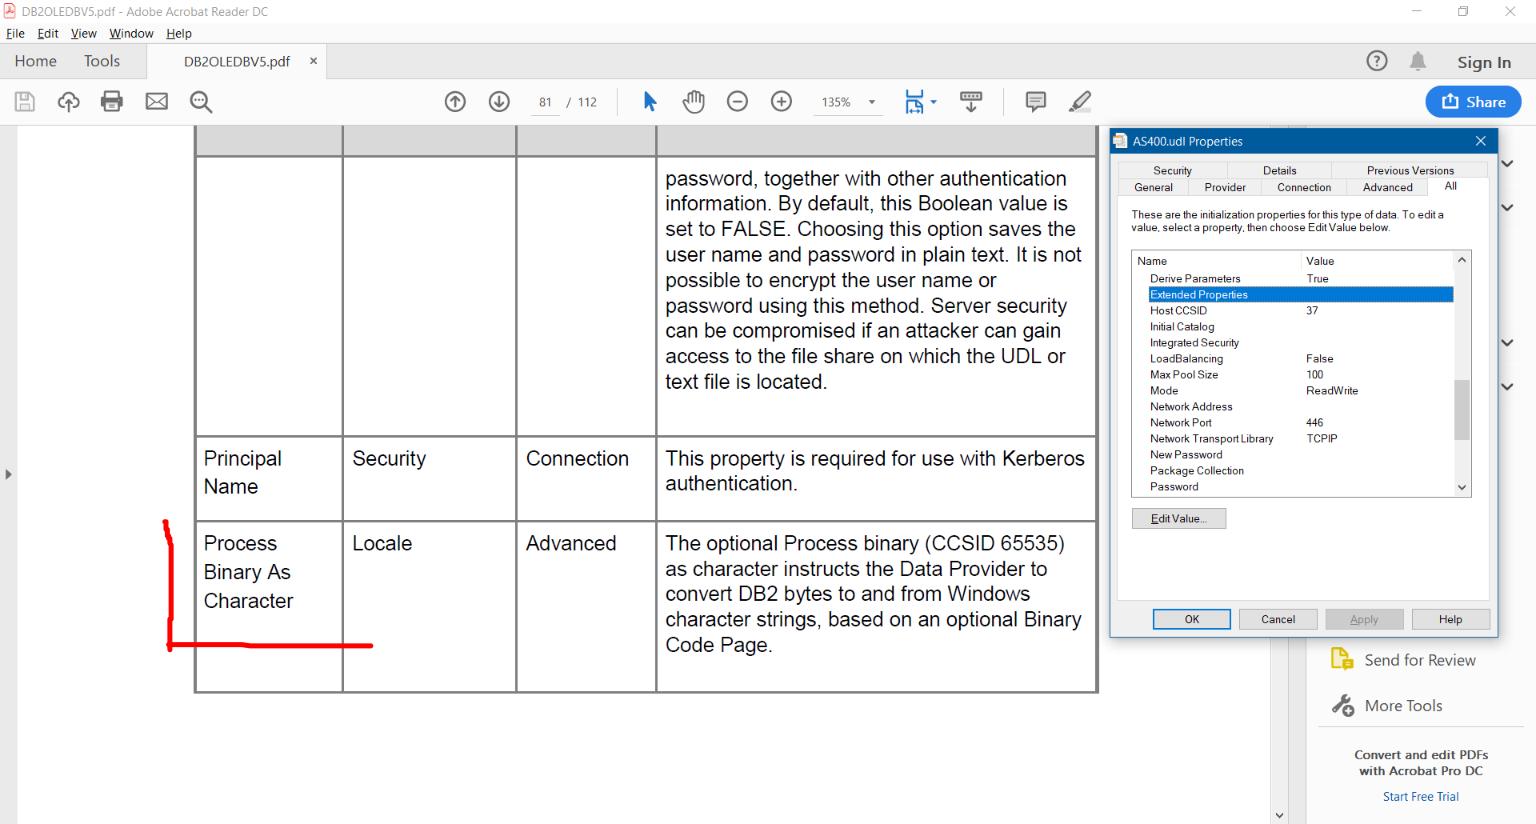 SSIS Microsoft oledb provider for DB2 - iSeries/AS400 data source